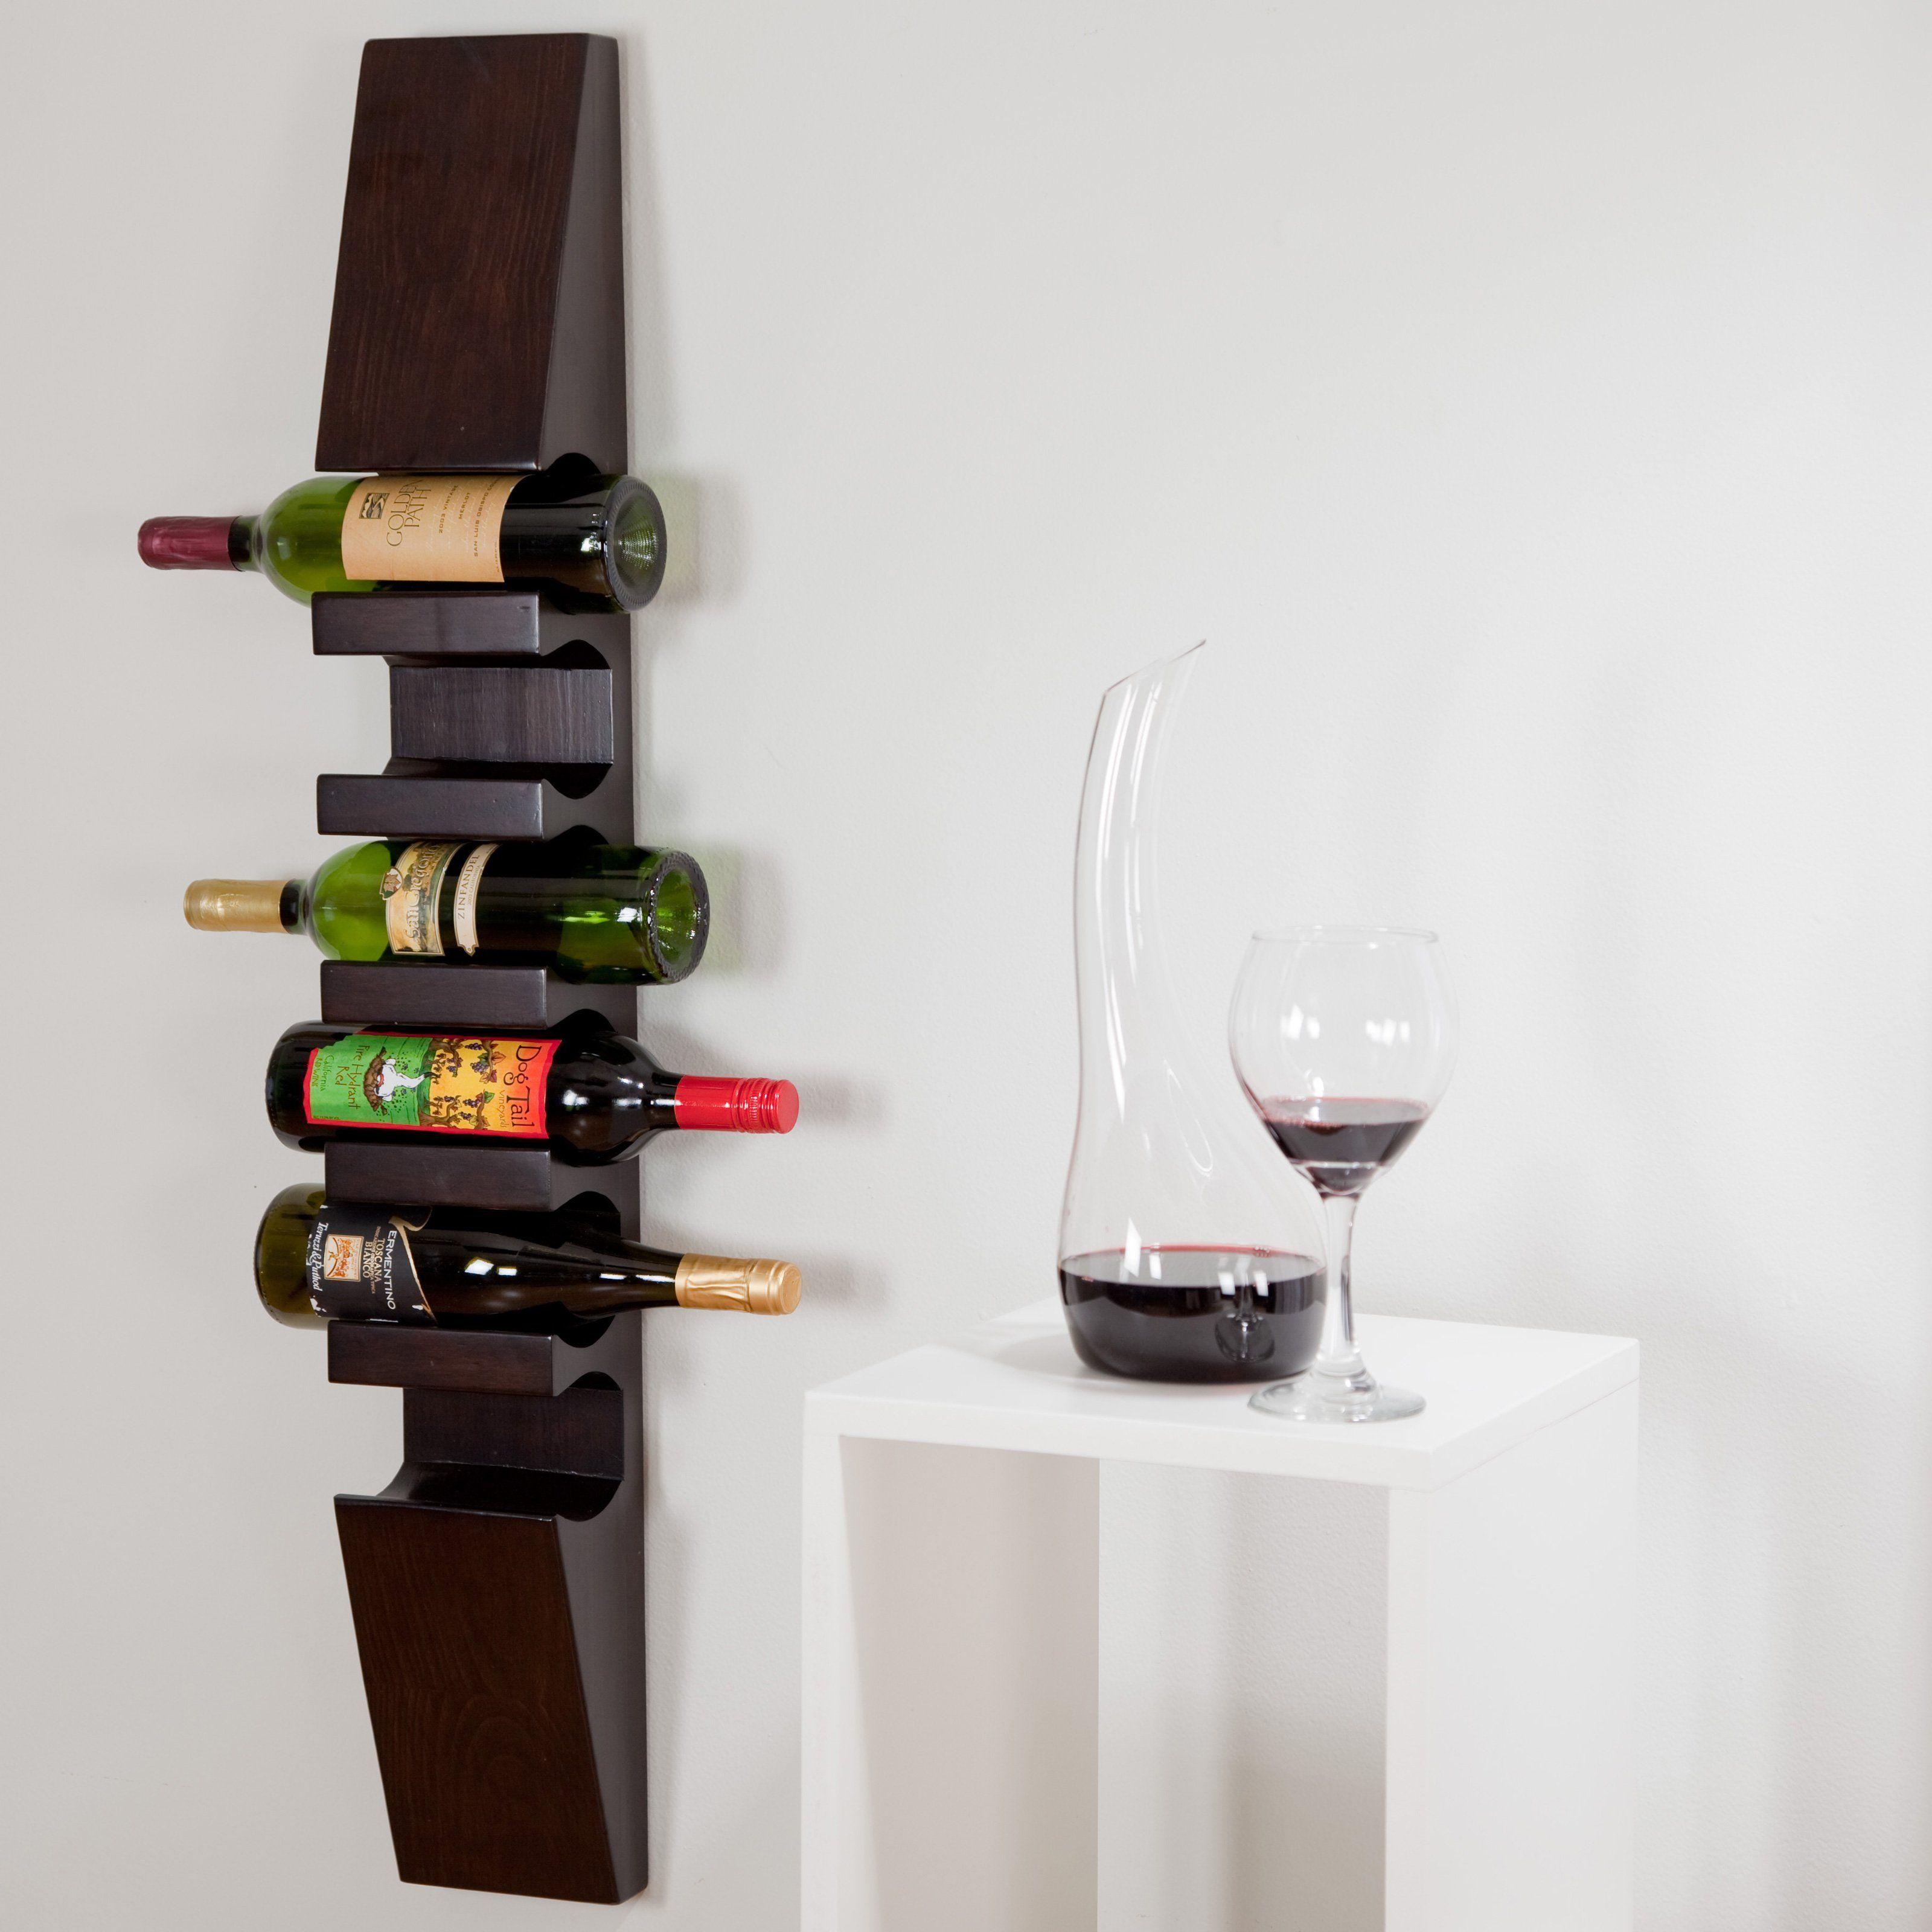 mounted oa wall wood ideas elegant image racks metal kitchen wine ikea full creative wallhanging mount rack vintage in